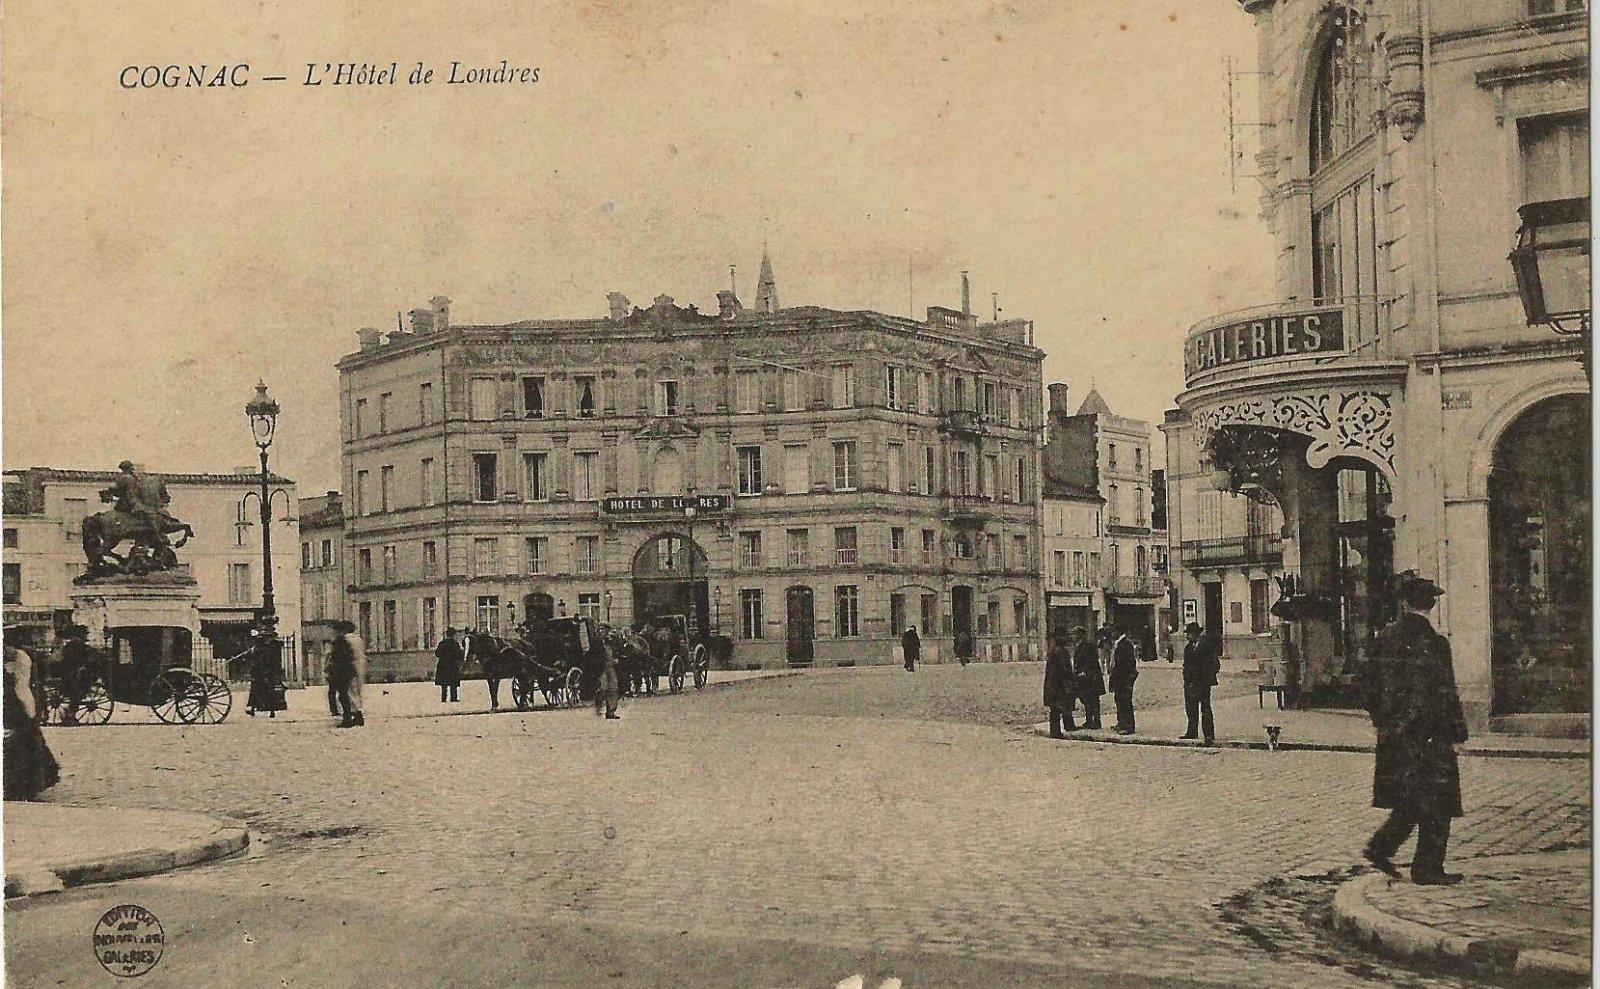 cognac hotel de londres 1915